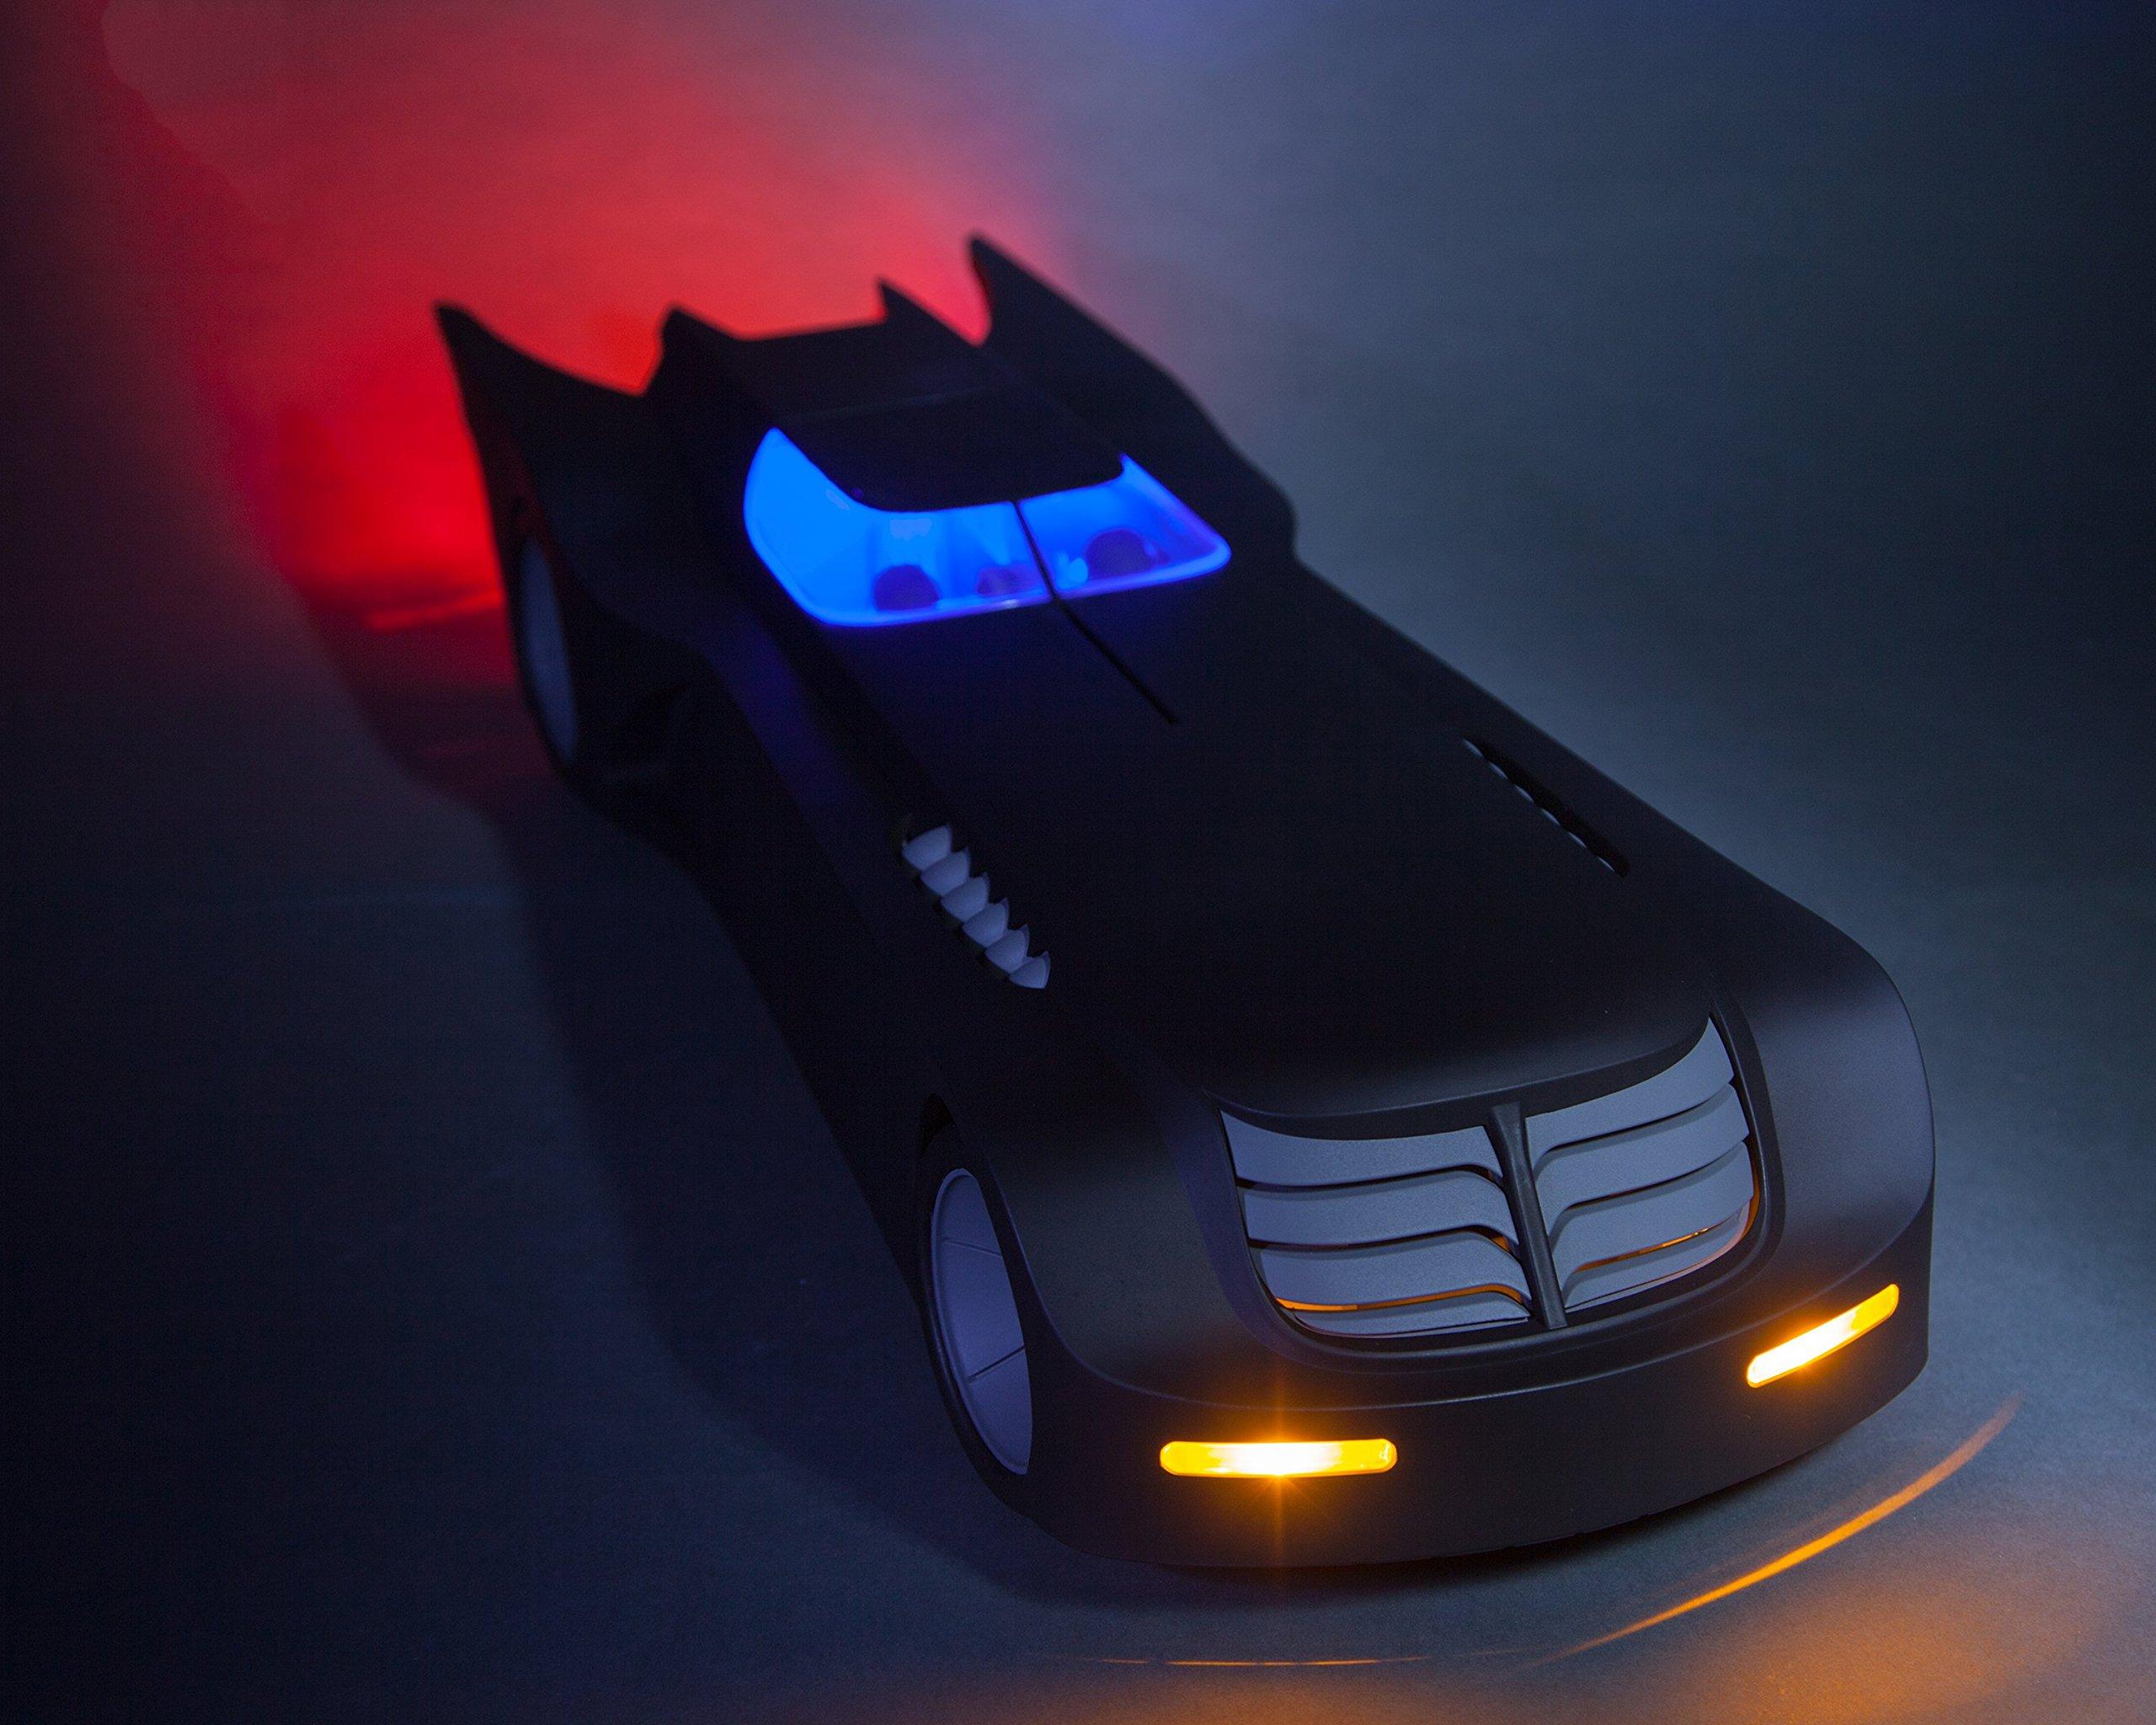 gift knight batmobile dc collectibles batman the animated series 24 long dark ebay. Black Bedroom Furniture Sets. Home Design Ideas